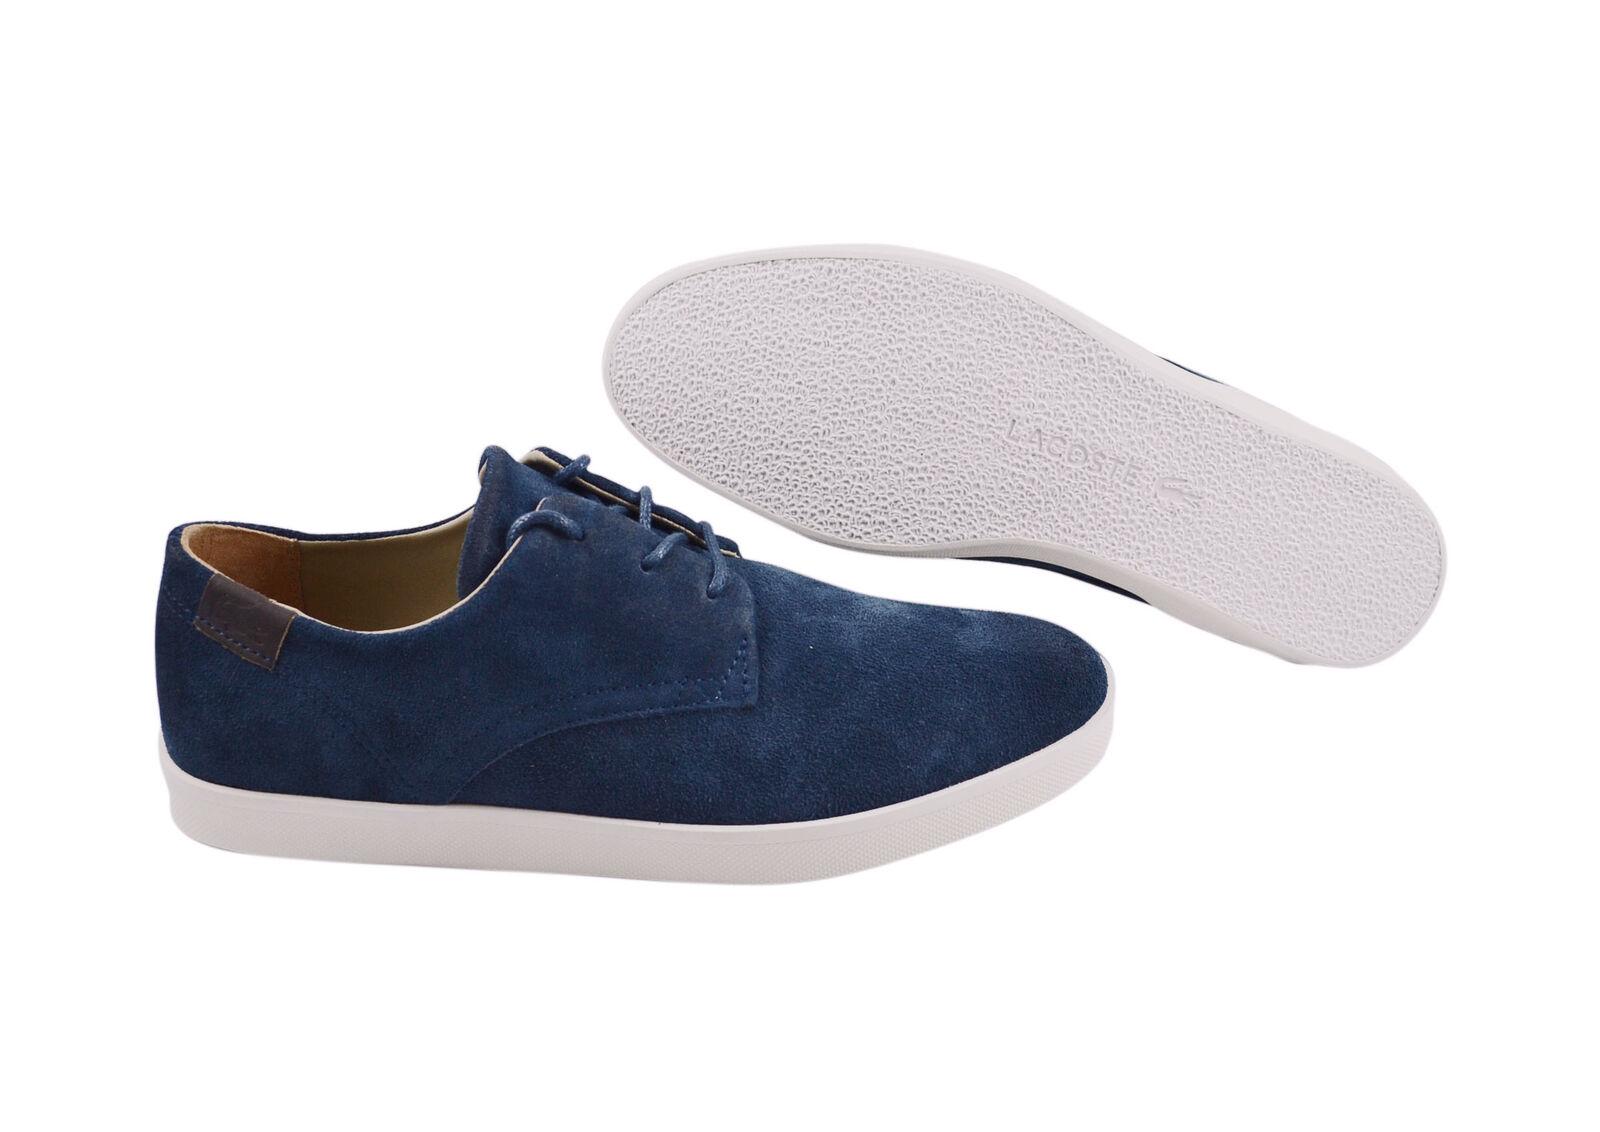 Lacoste Zimri blue 3 SRM dark blue Zimri Leder Schuhe/Sneaker Größenauswahl!! 6f18b6